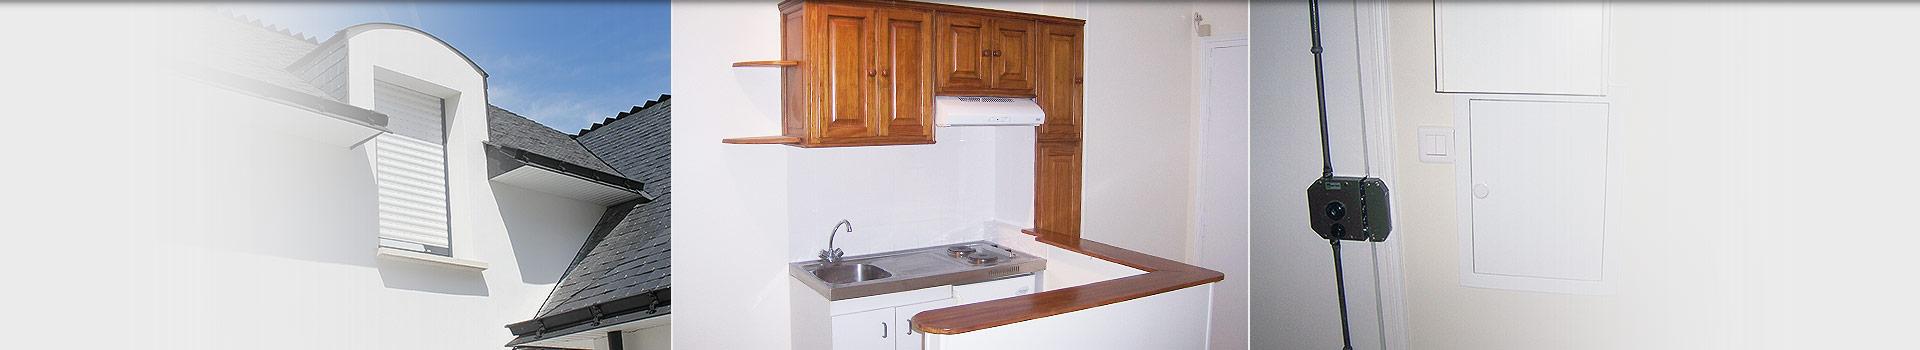 renover-appartement-fontenay-sous-bois